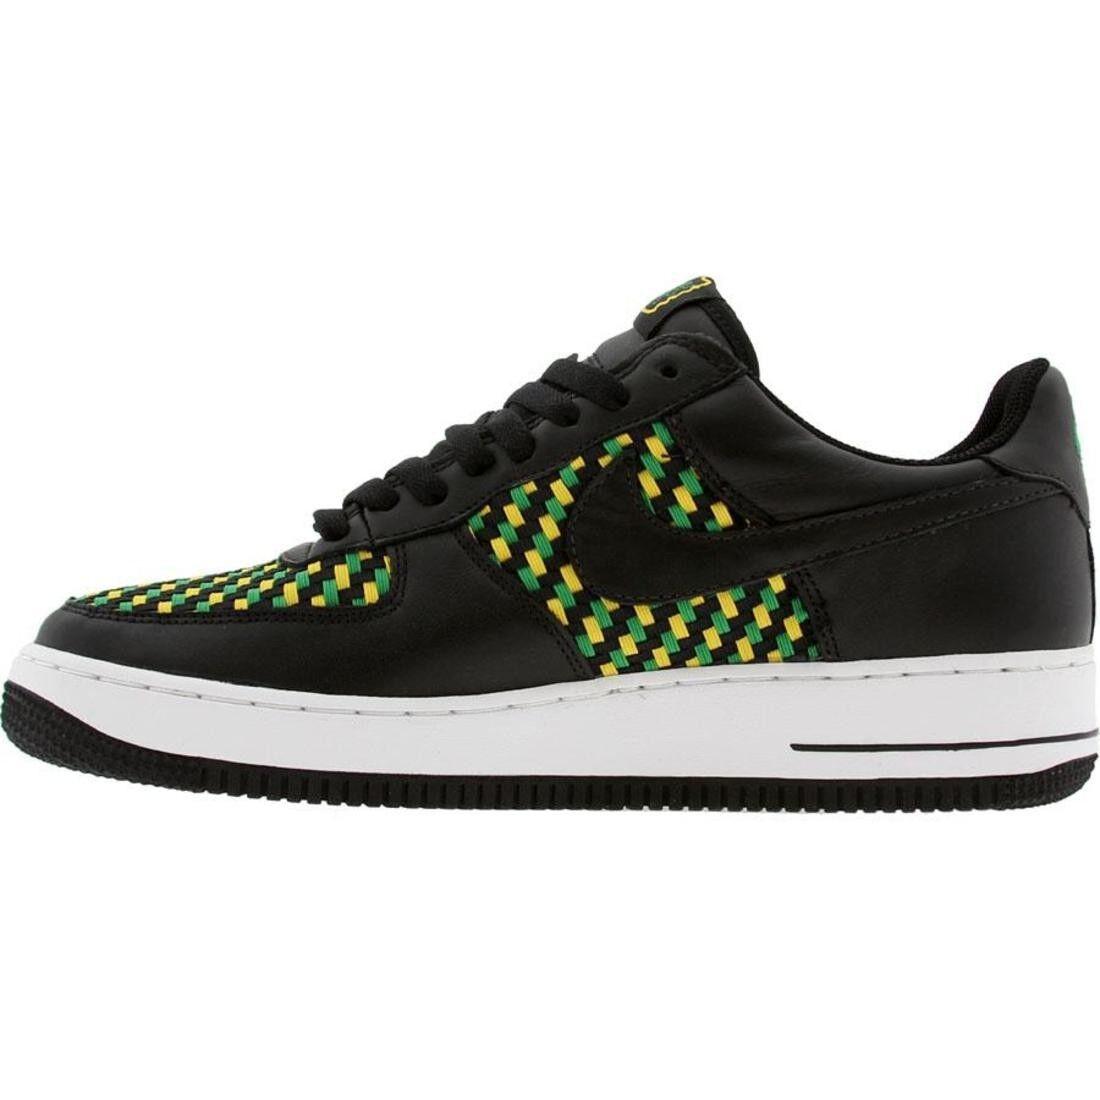 Nike Air Force 1 Low Premium West Indies 4 Jamaica Black Green